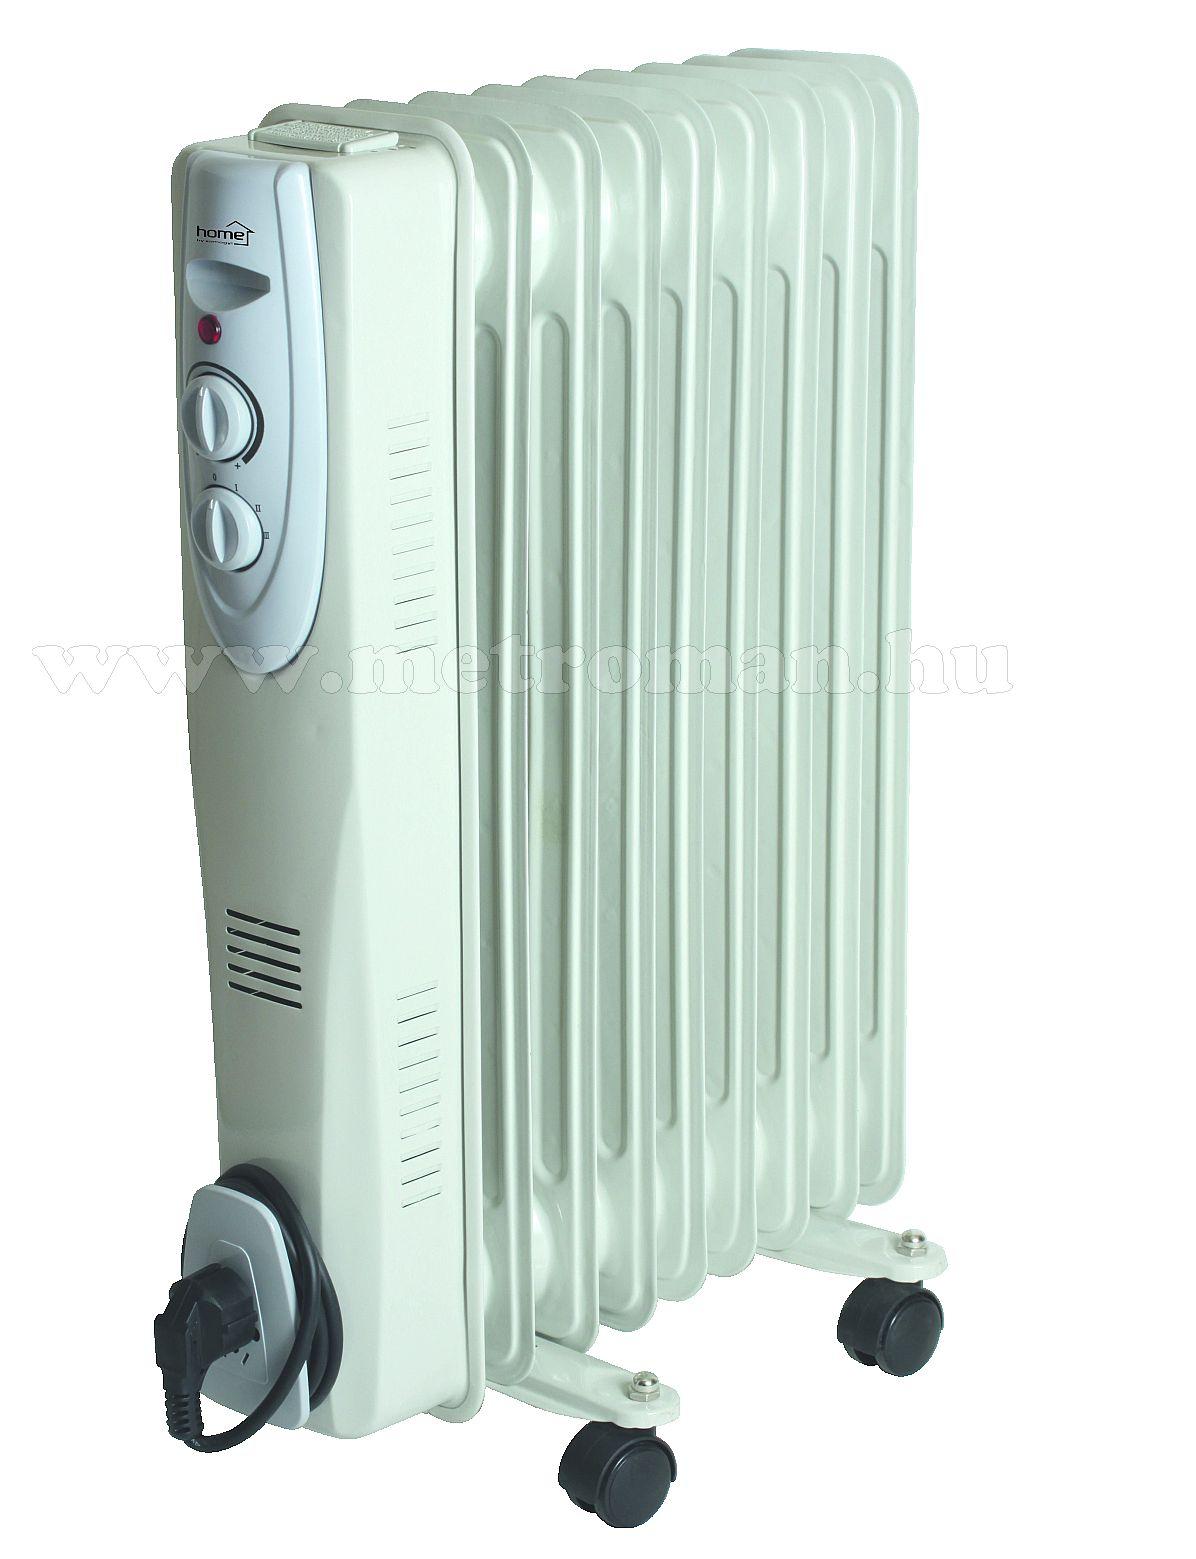 Elektromos olajradiátor, HOME FKOS 9